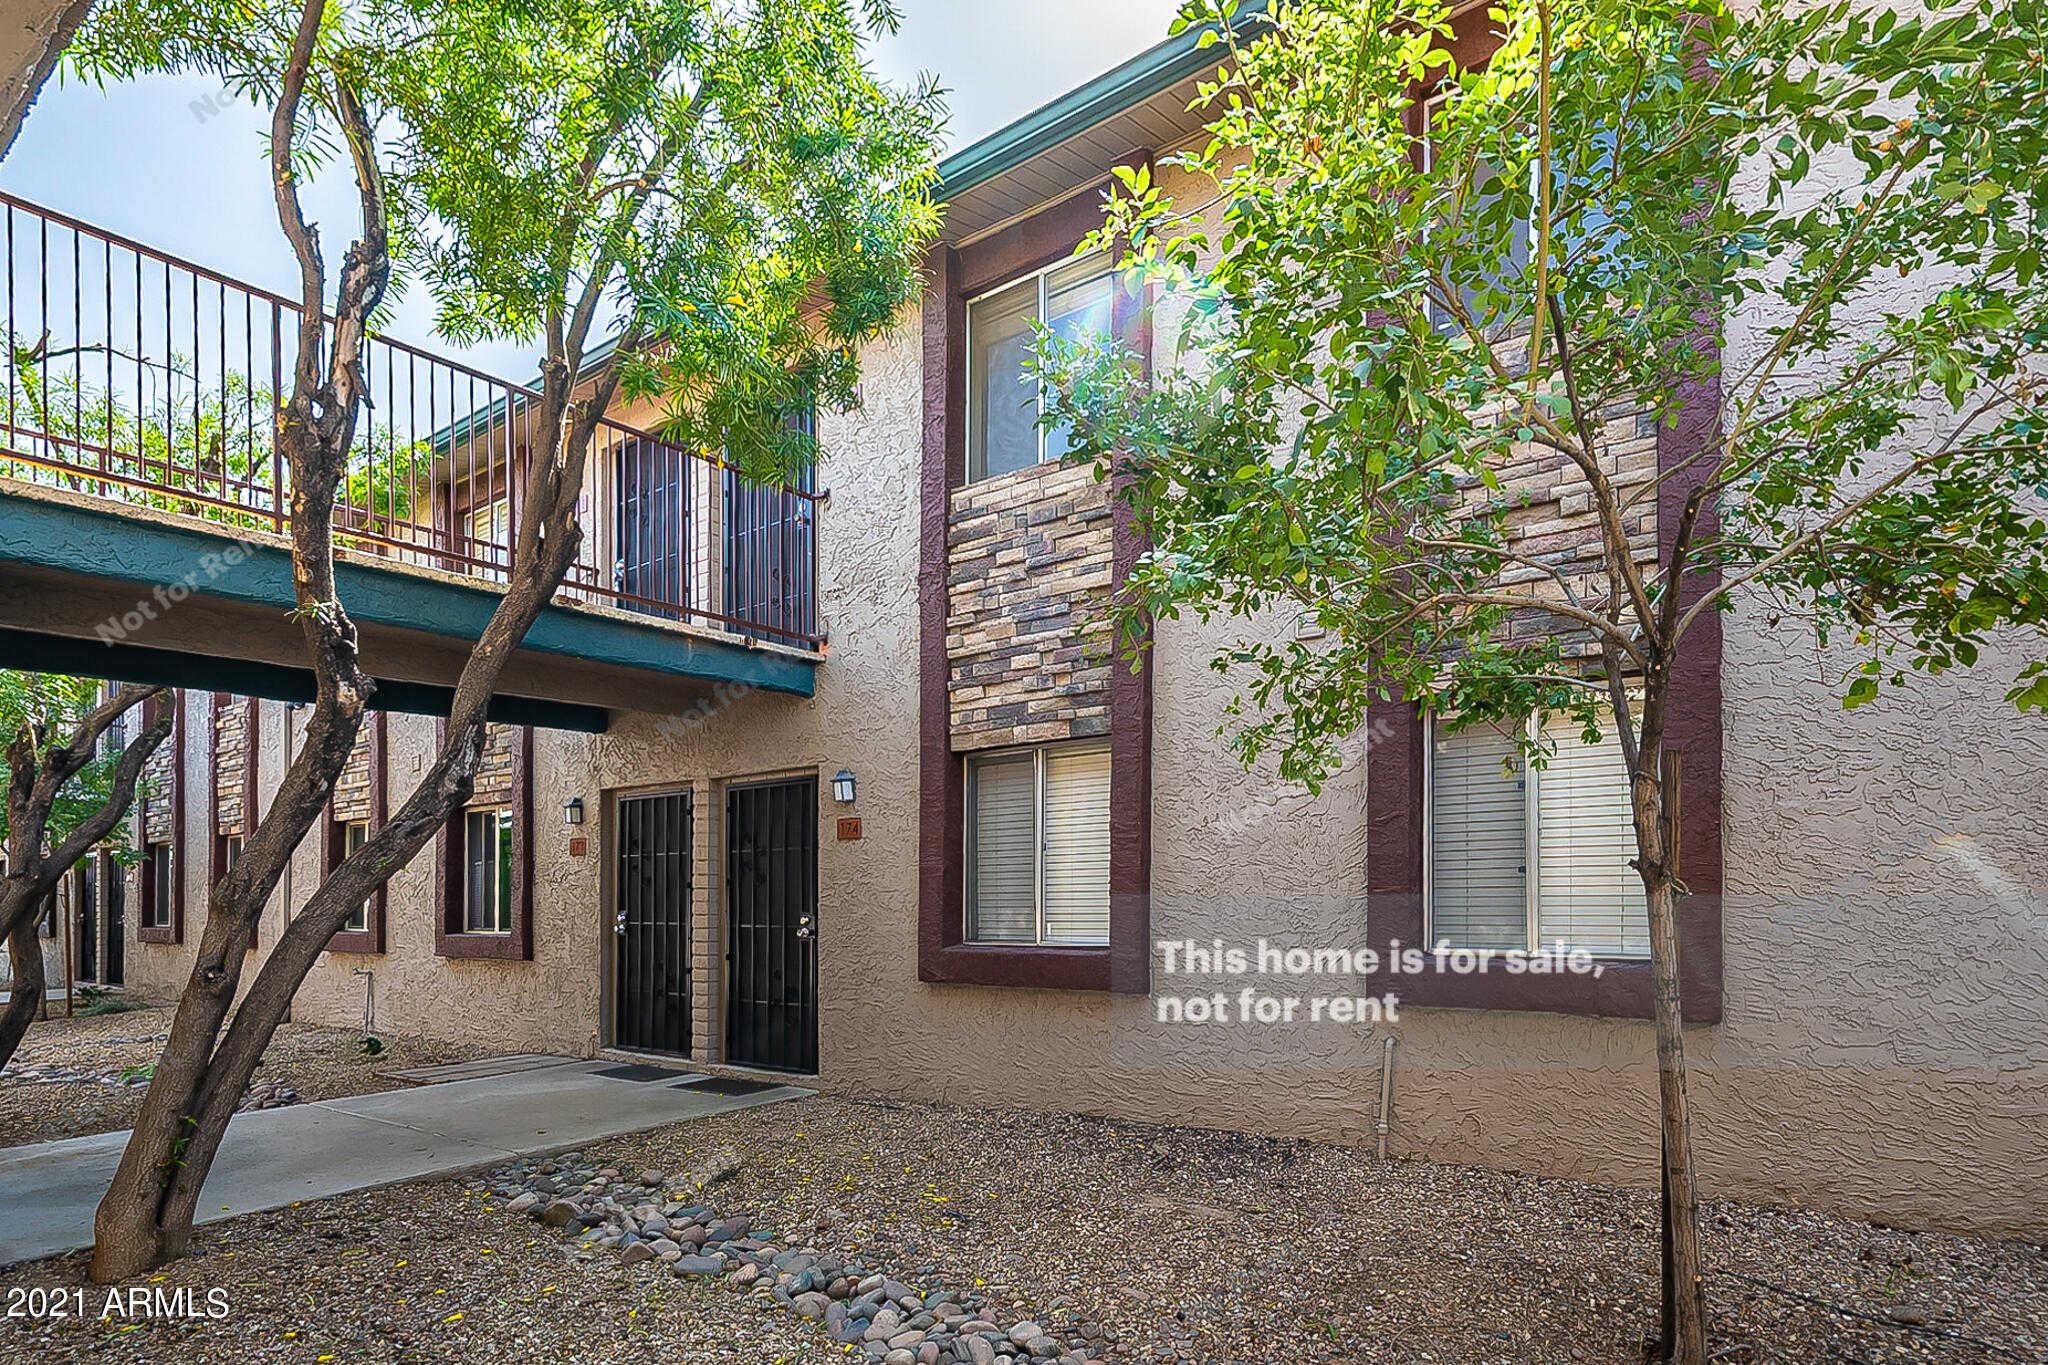 $252,000 - 1Br/1Ba -  for Sale in Scottsdale Park Place Condominium, Scottsdale